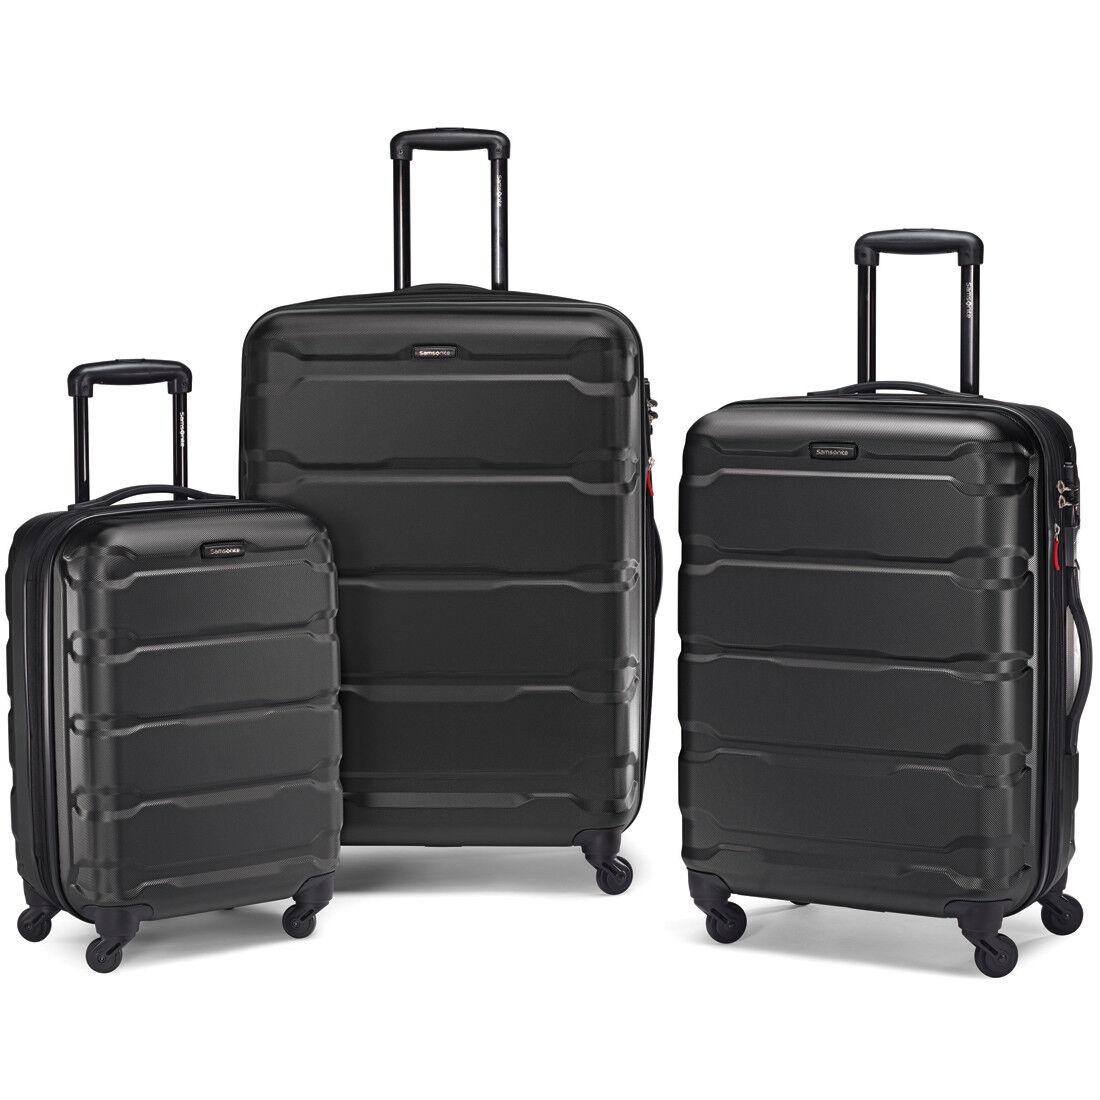 Samsonite Omni Hardside 3 Piece Nested Spinner Luggage Set (20, 24, & 28 Inch) Black